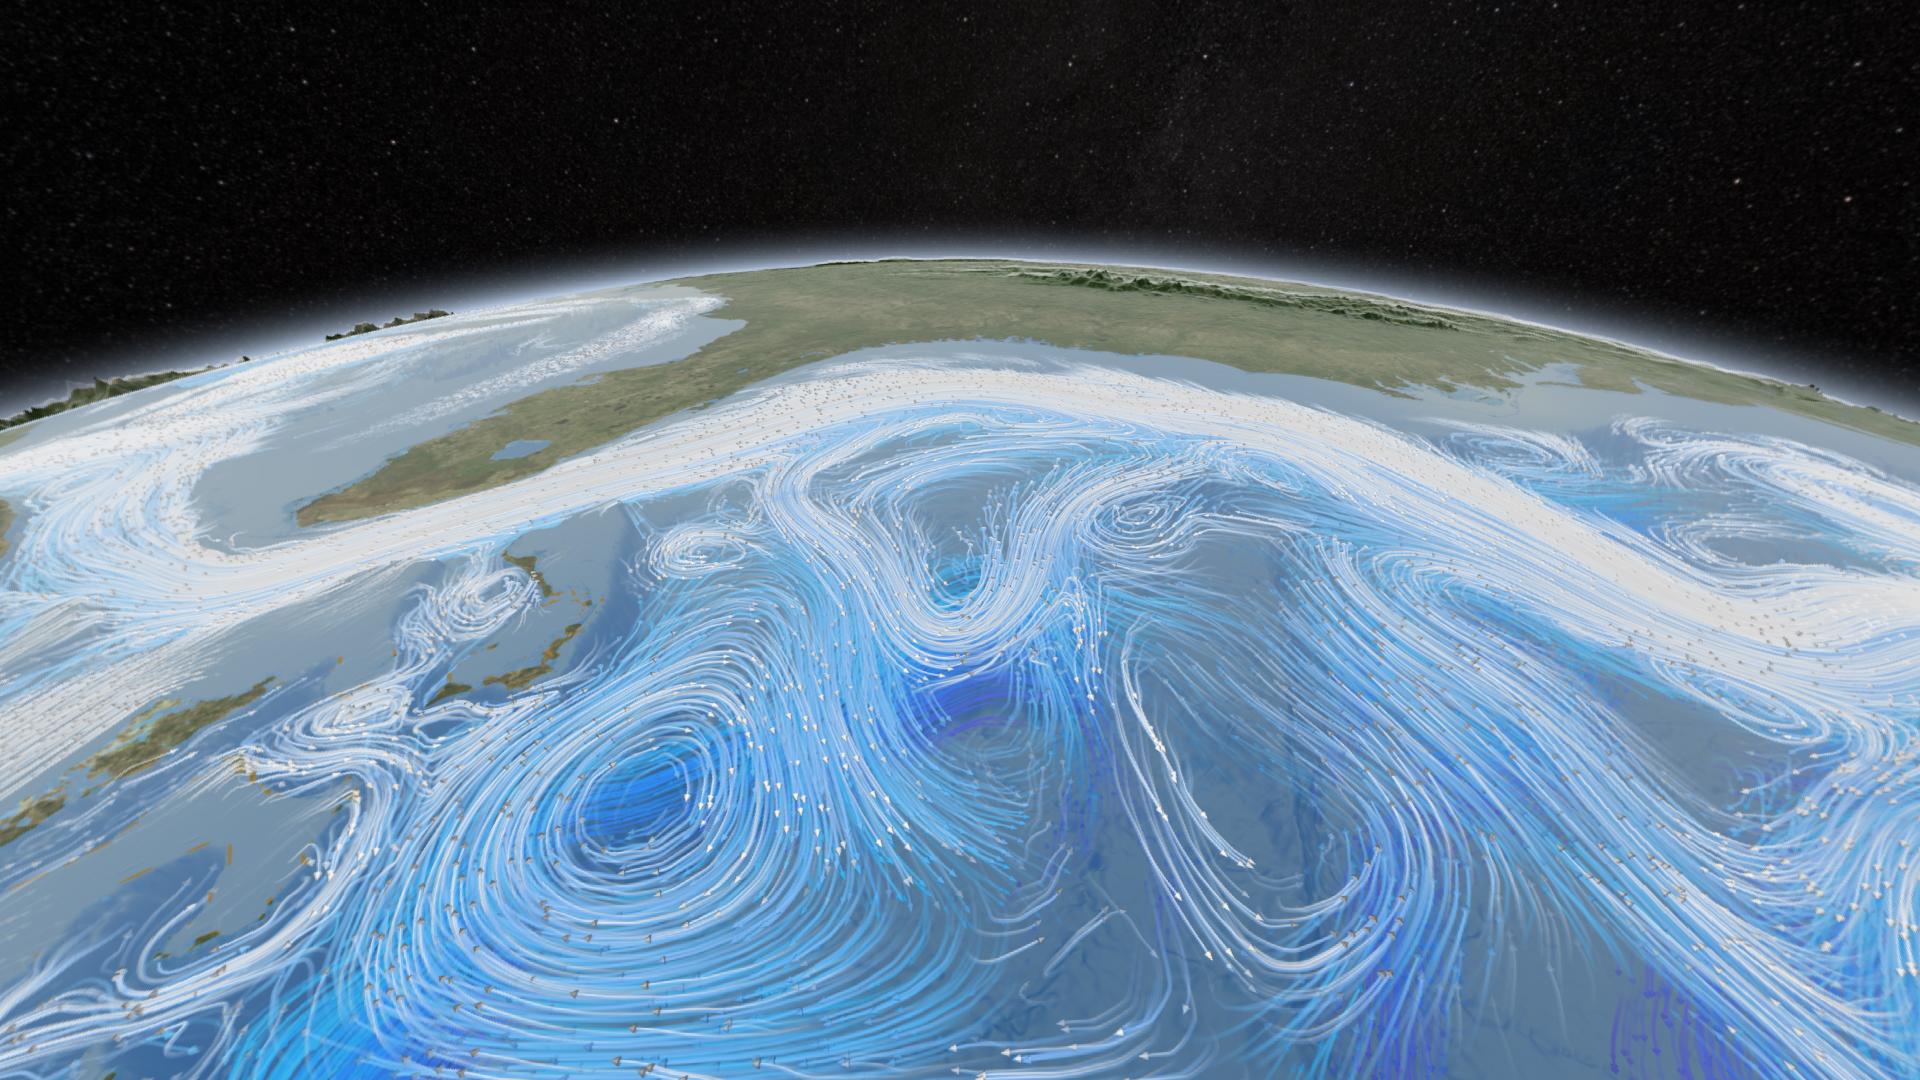 Nasa S Scientific Visualization Studio Wins First Place In